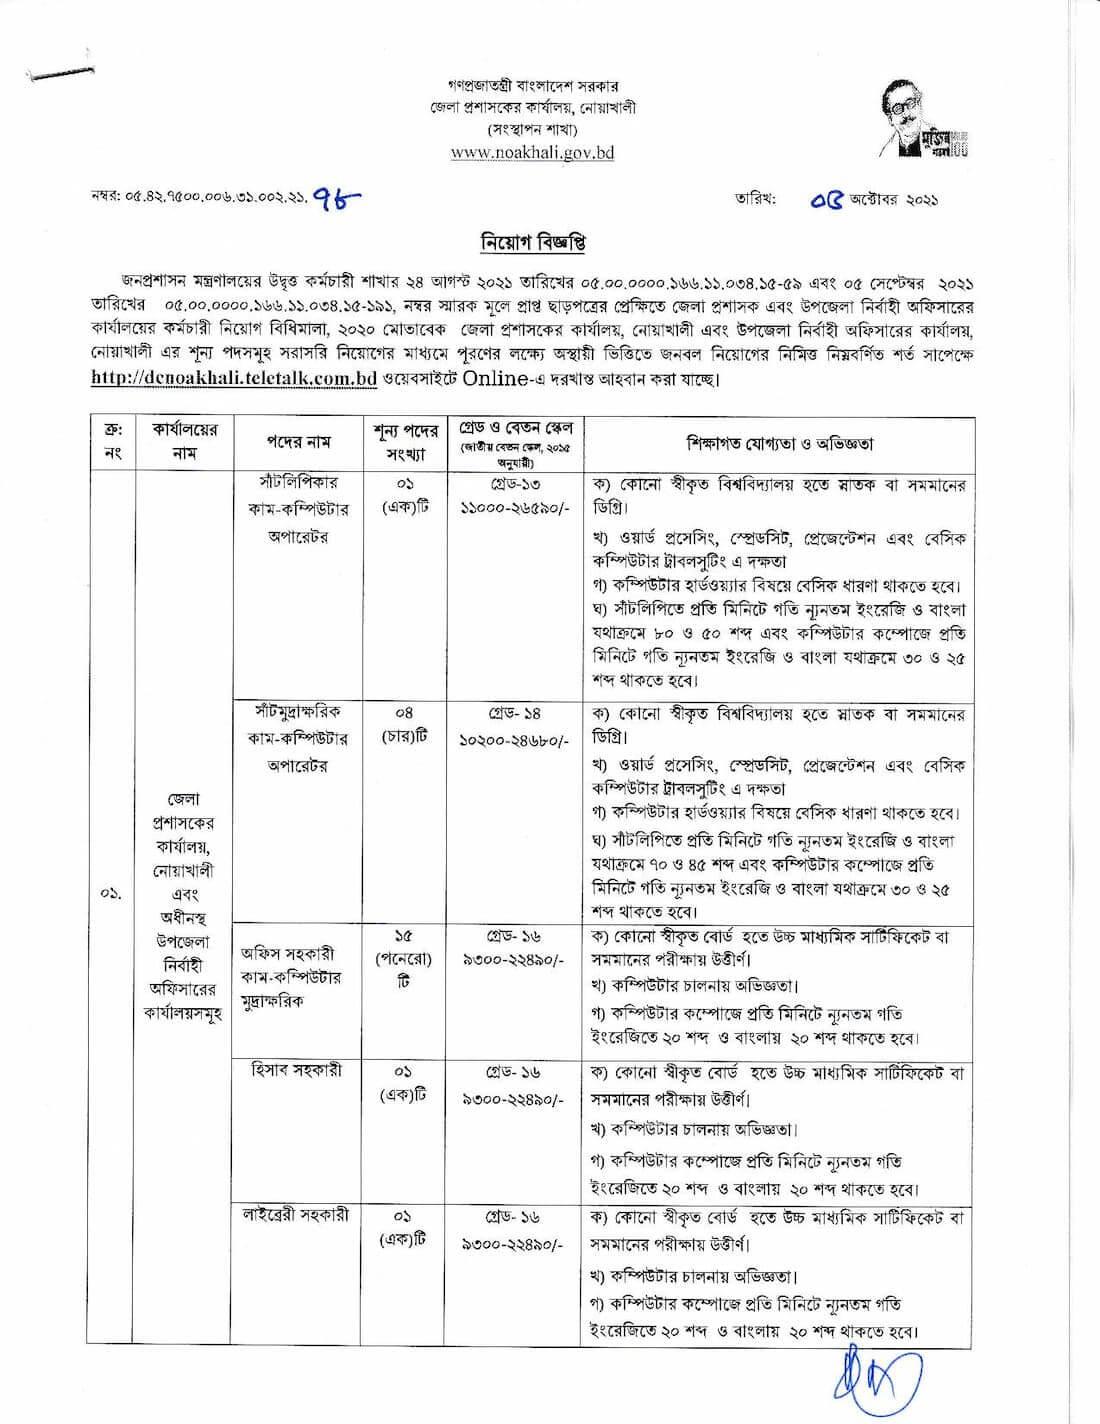 Noakhali DC Office Job Circular image 2021